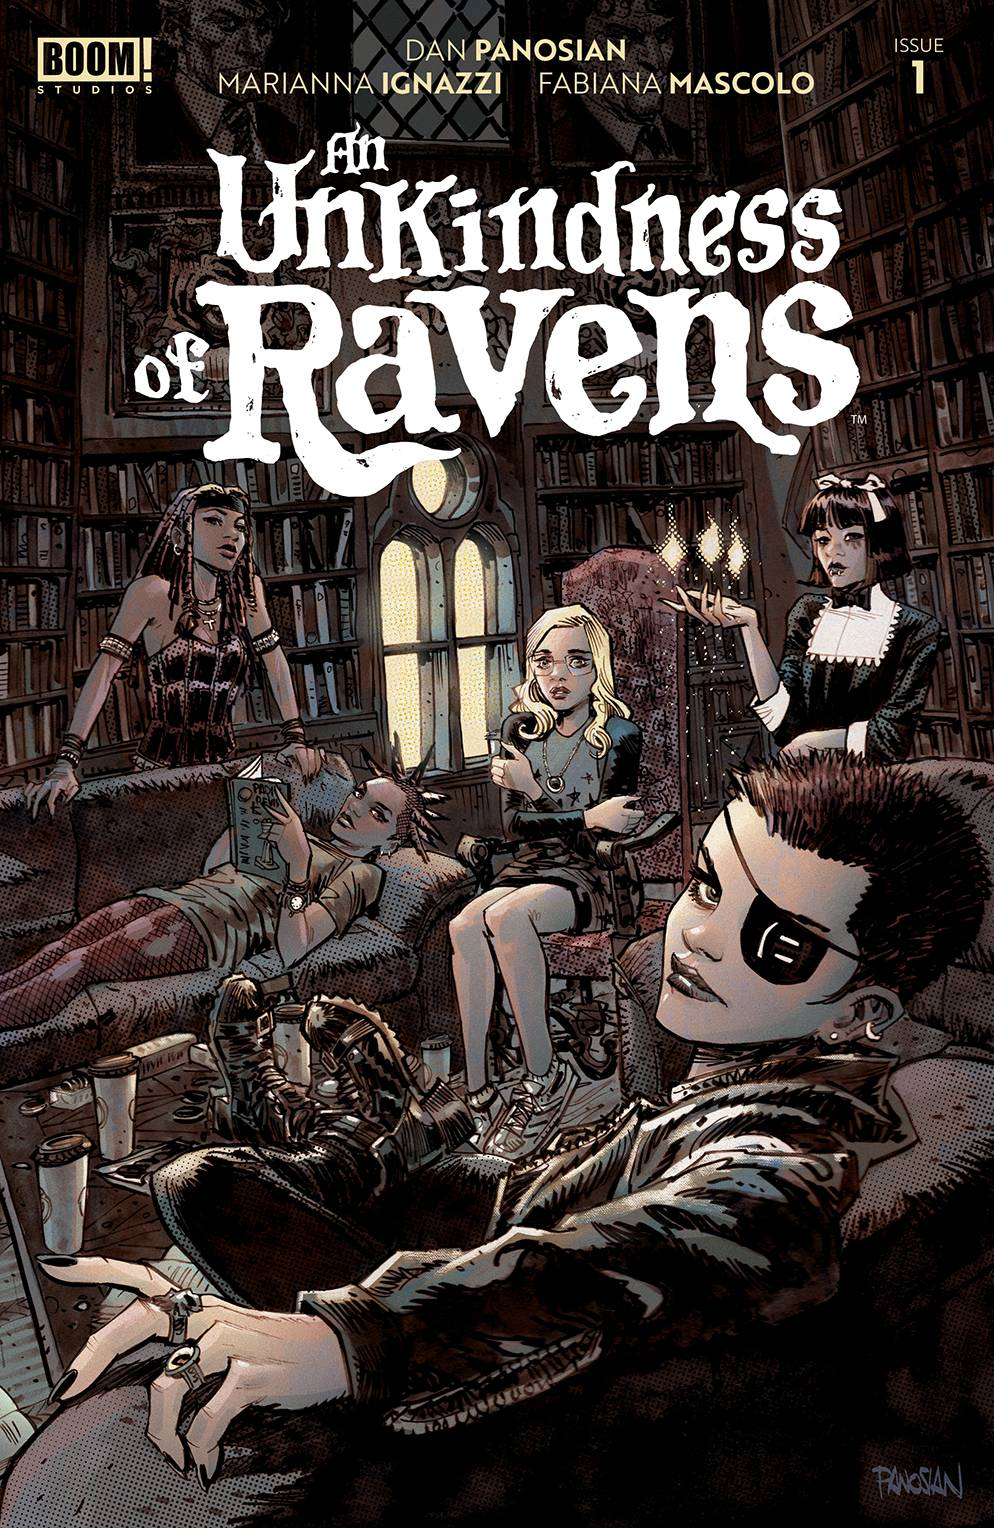 UNKINDNESS OF RAVENS #1 CVR A MAIN